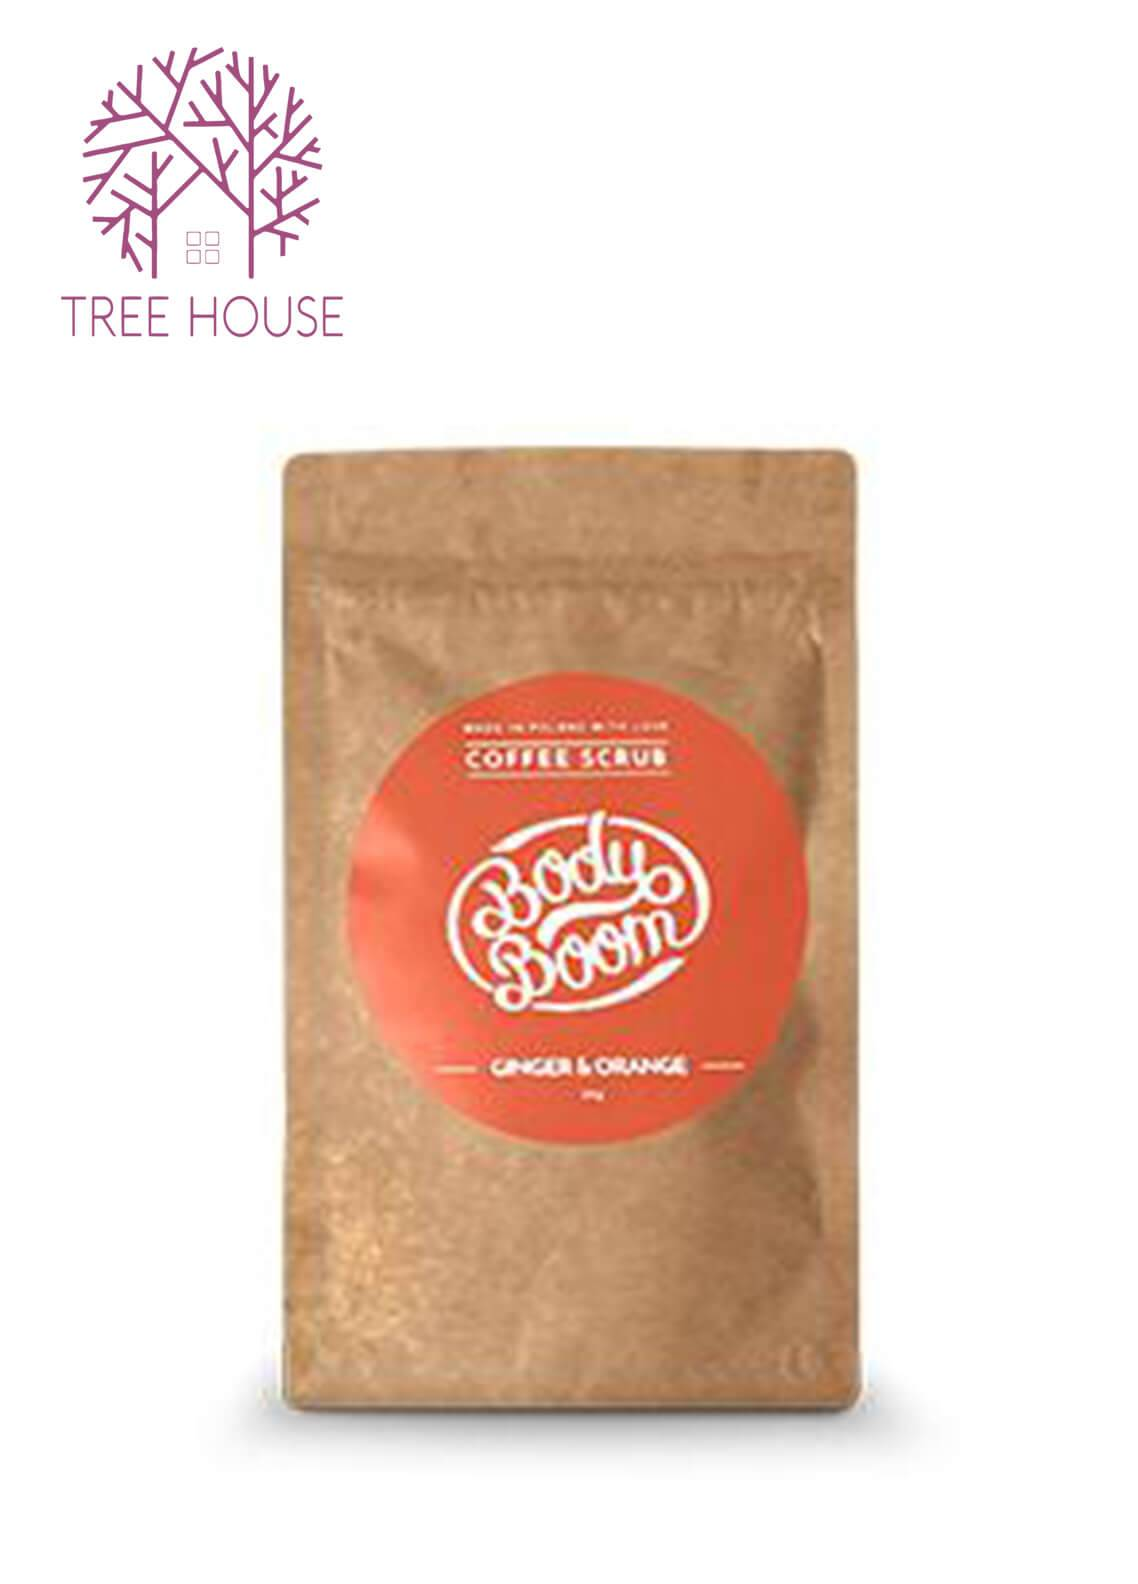 Body Boom Coffee Scrub (Ginger Orange)